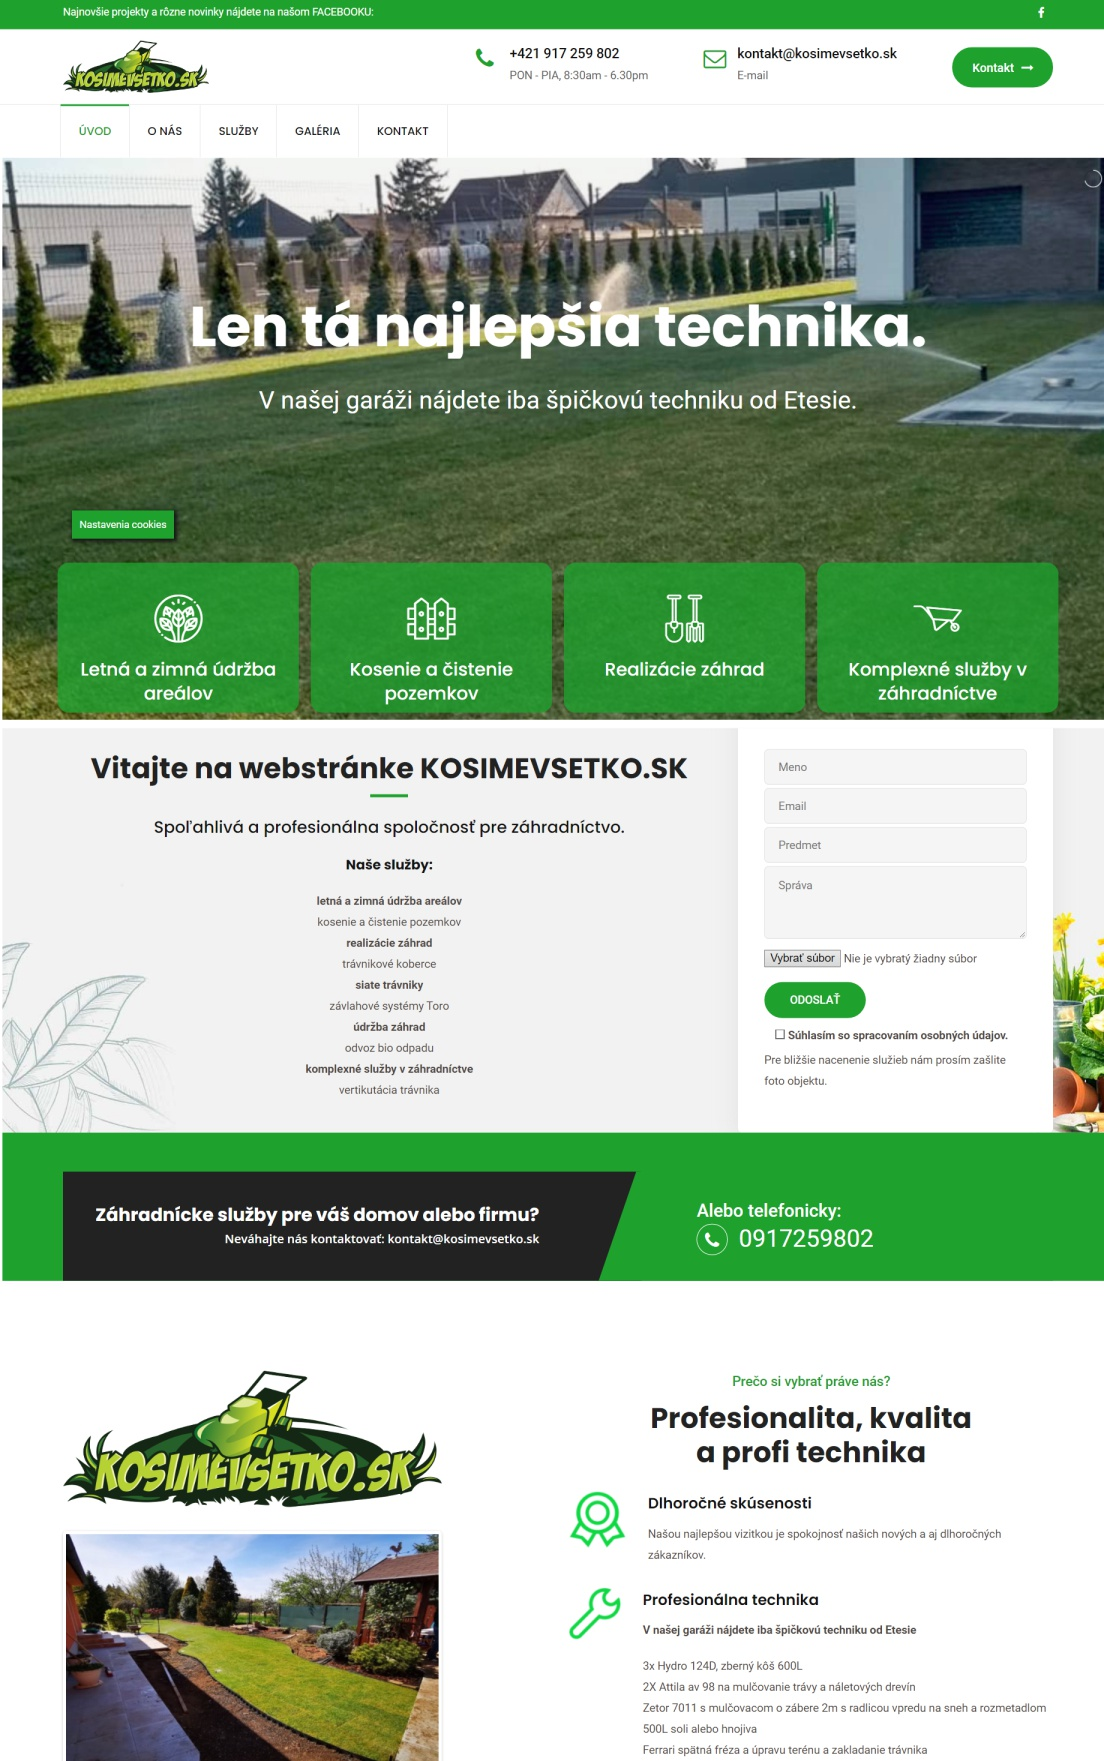 Kosimevsetko.sk